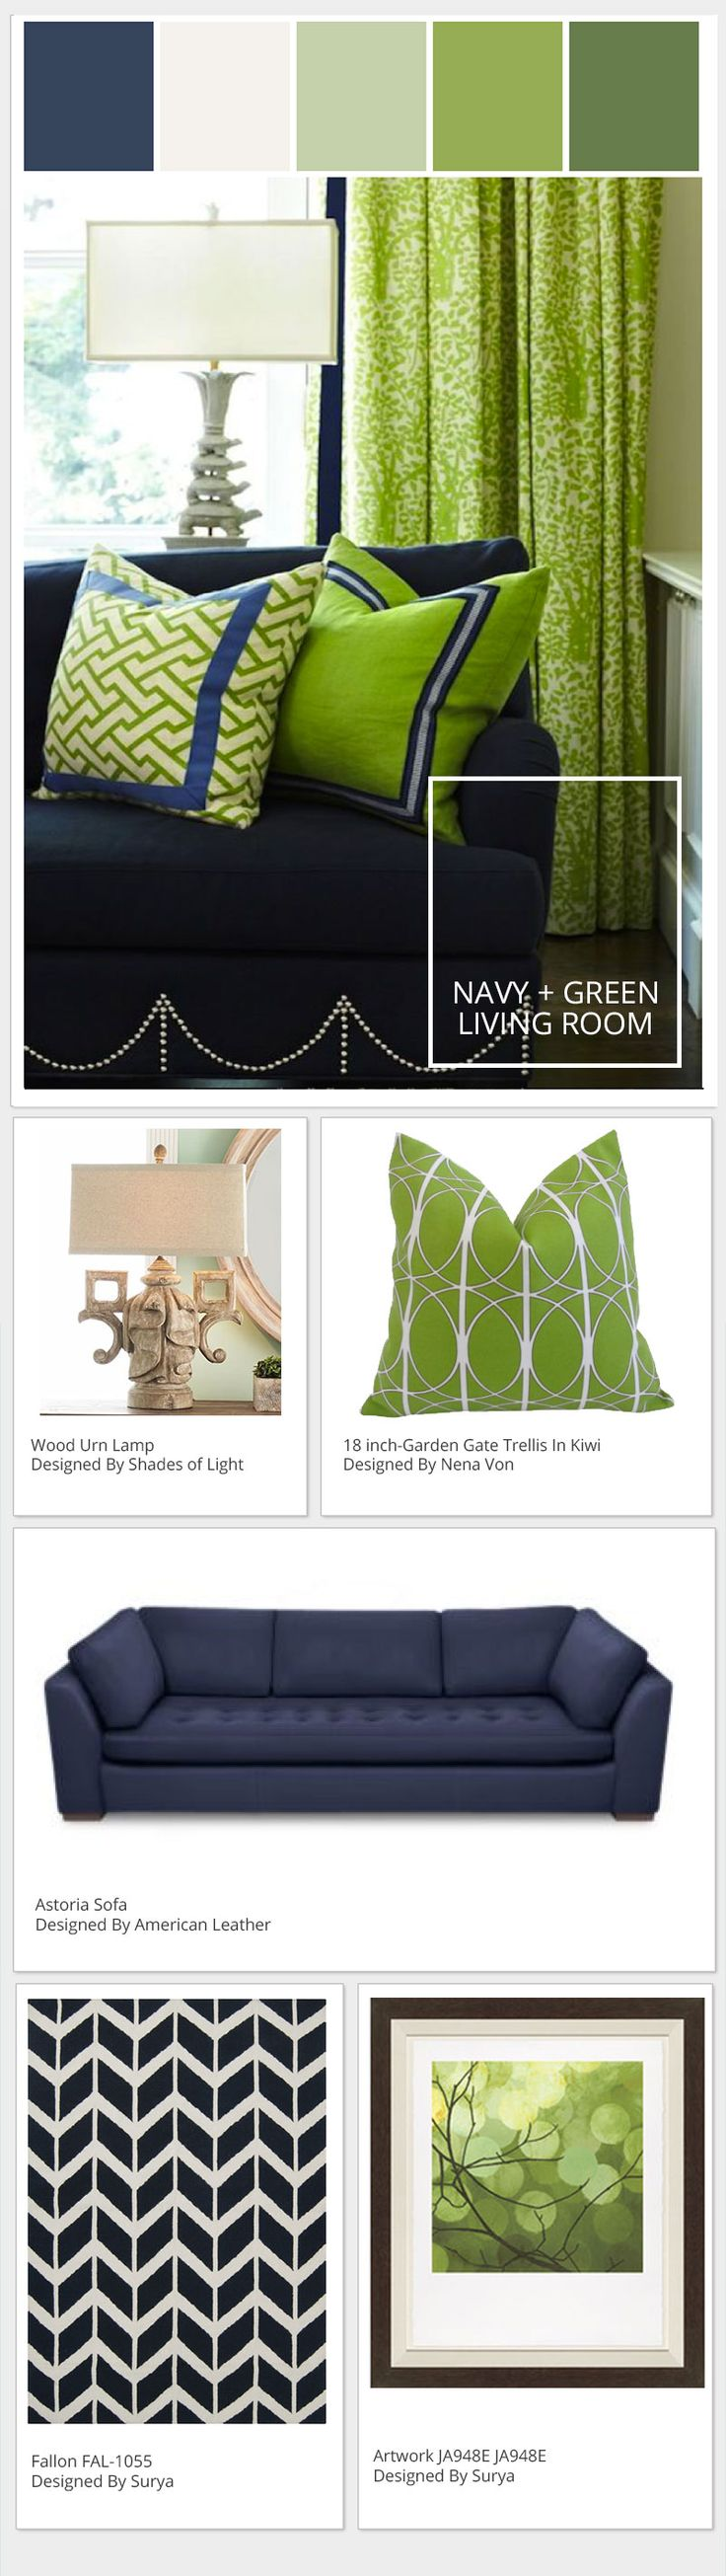 Motivation Monday | Seahawks Blue + Green Living Room - Stylyze